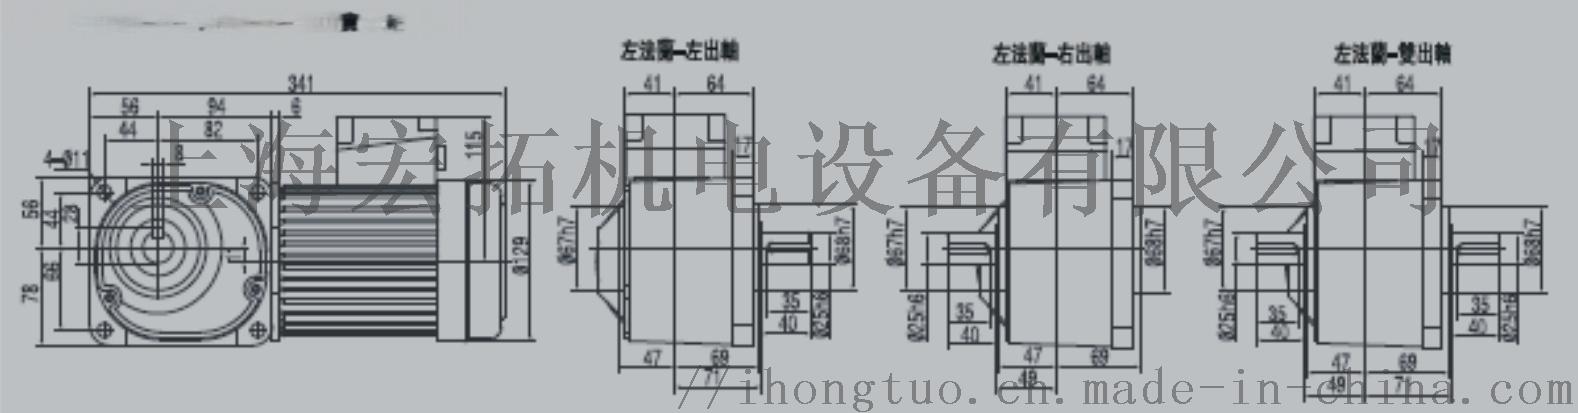 SGF25-S-0.4KW-(5-120)實心軸.png